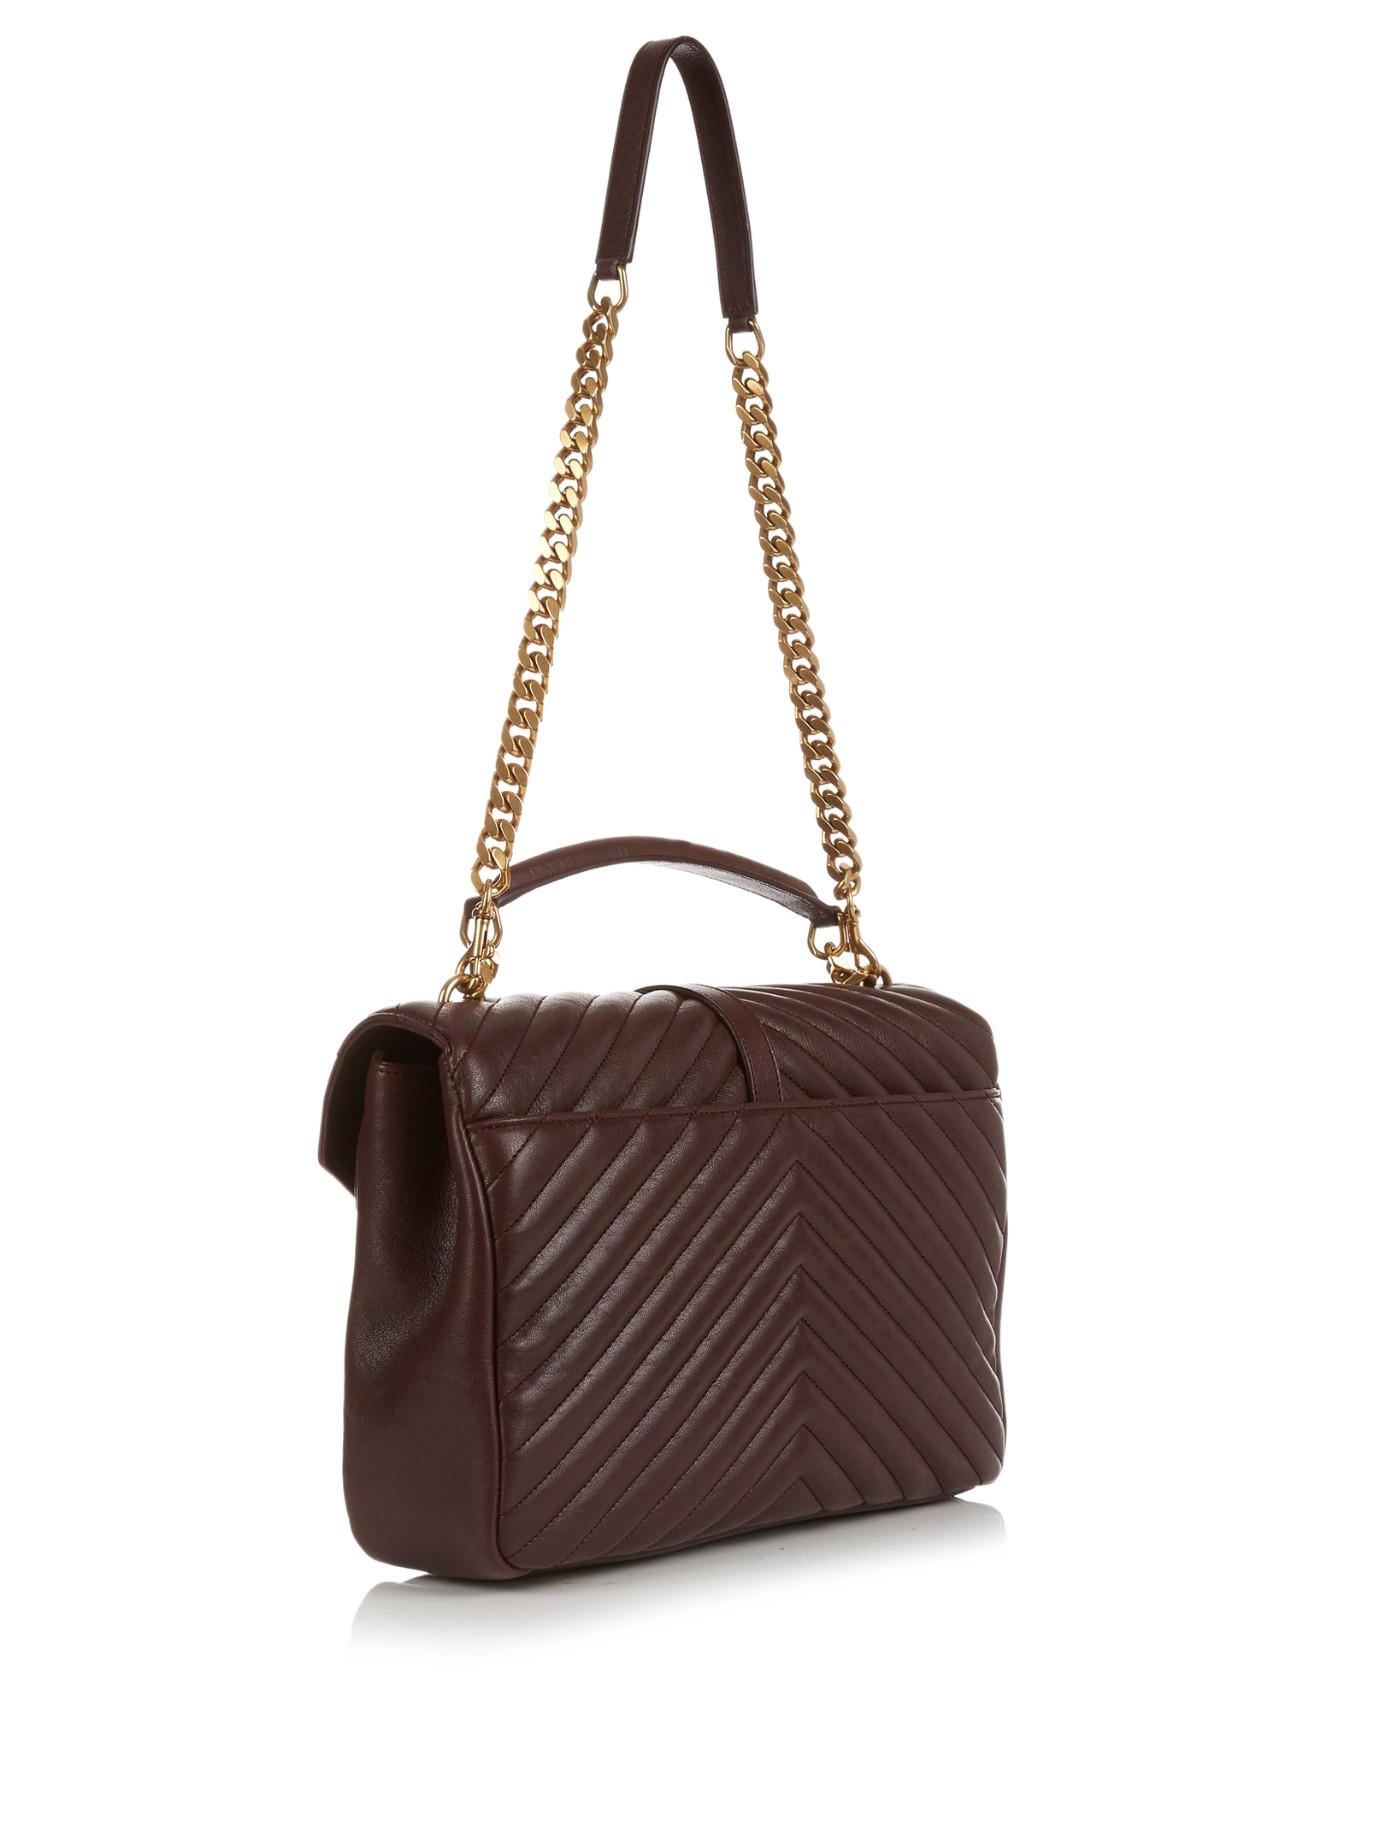 Saint laurent College Large Quilted Leather Shoulder Bag . 743dc77cb6f04